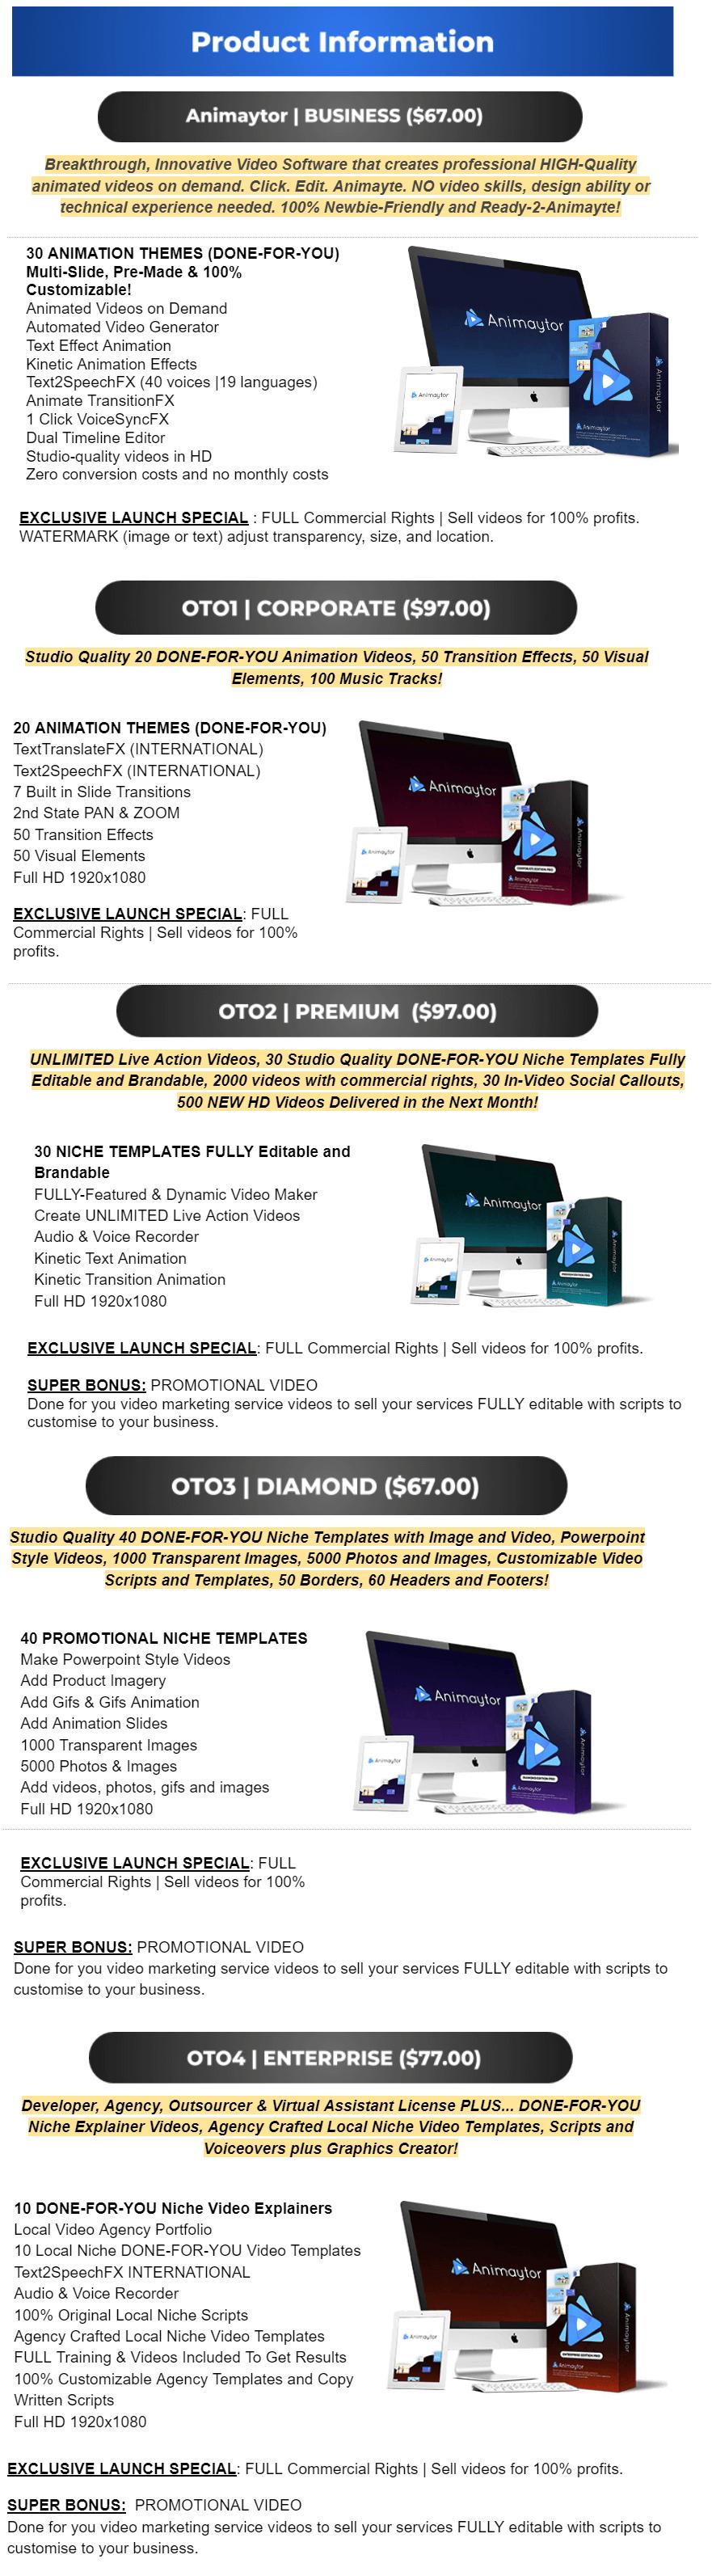 Animaytor-Review-Pricing